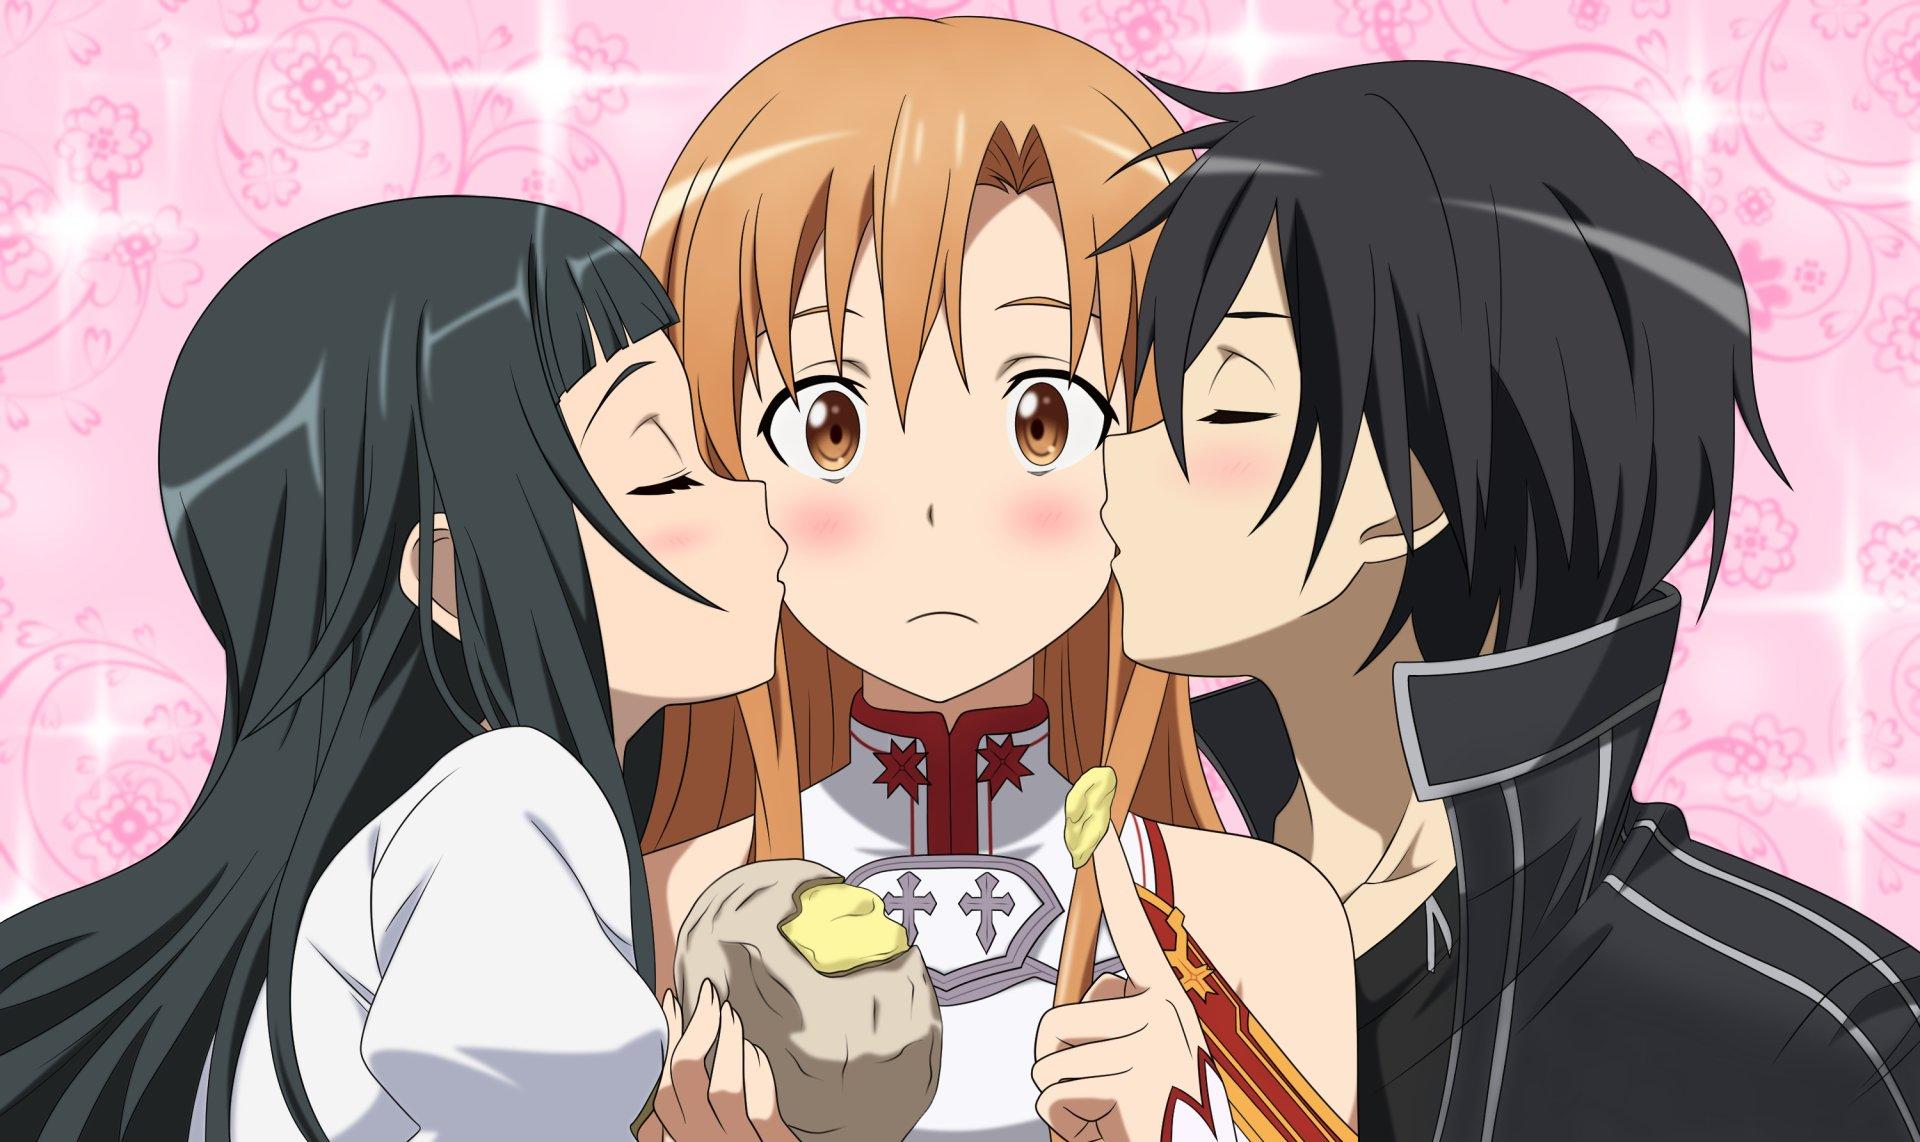 Anime - Sword Art Online  Kirito (Sword Art Online) Yui (Sword Art Online) Asuna Yuuki Wallpaper